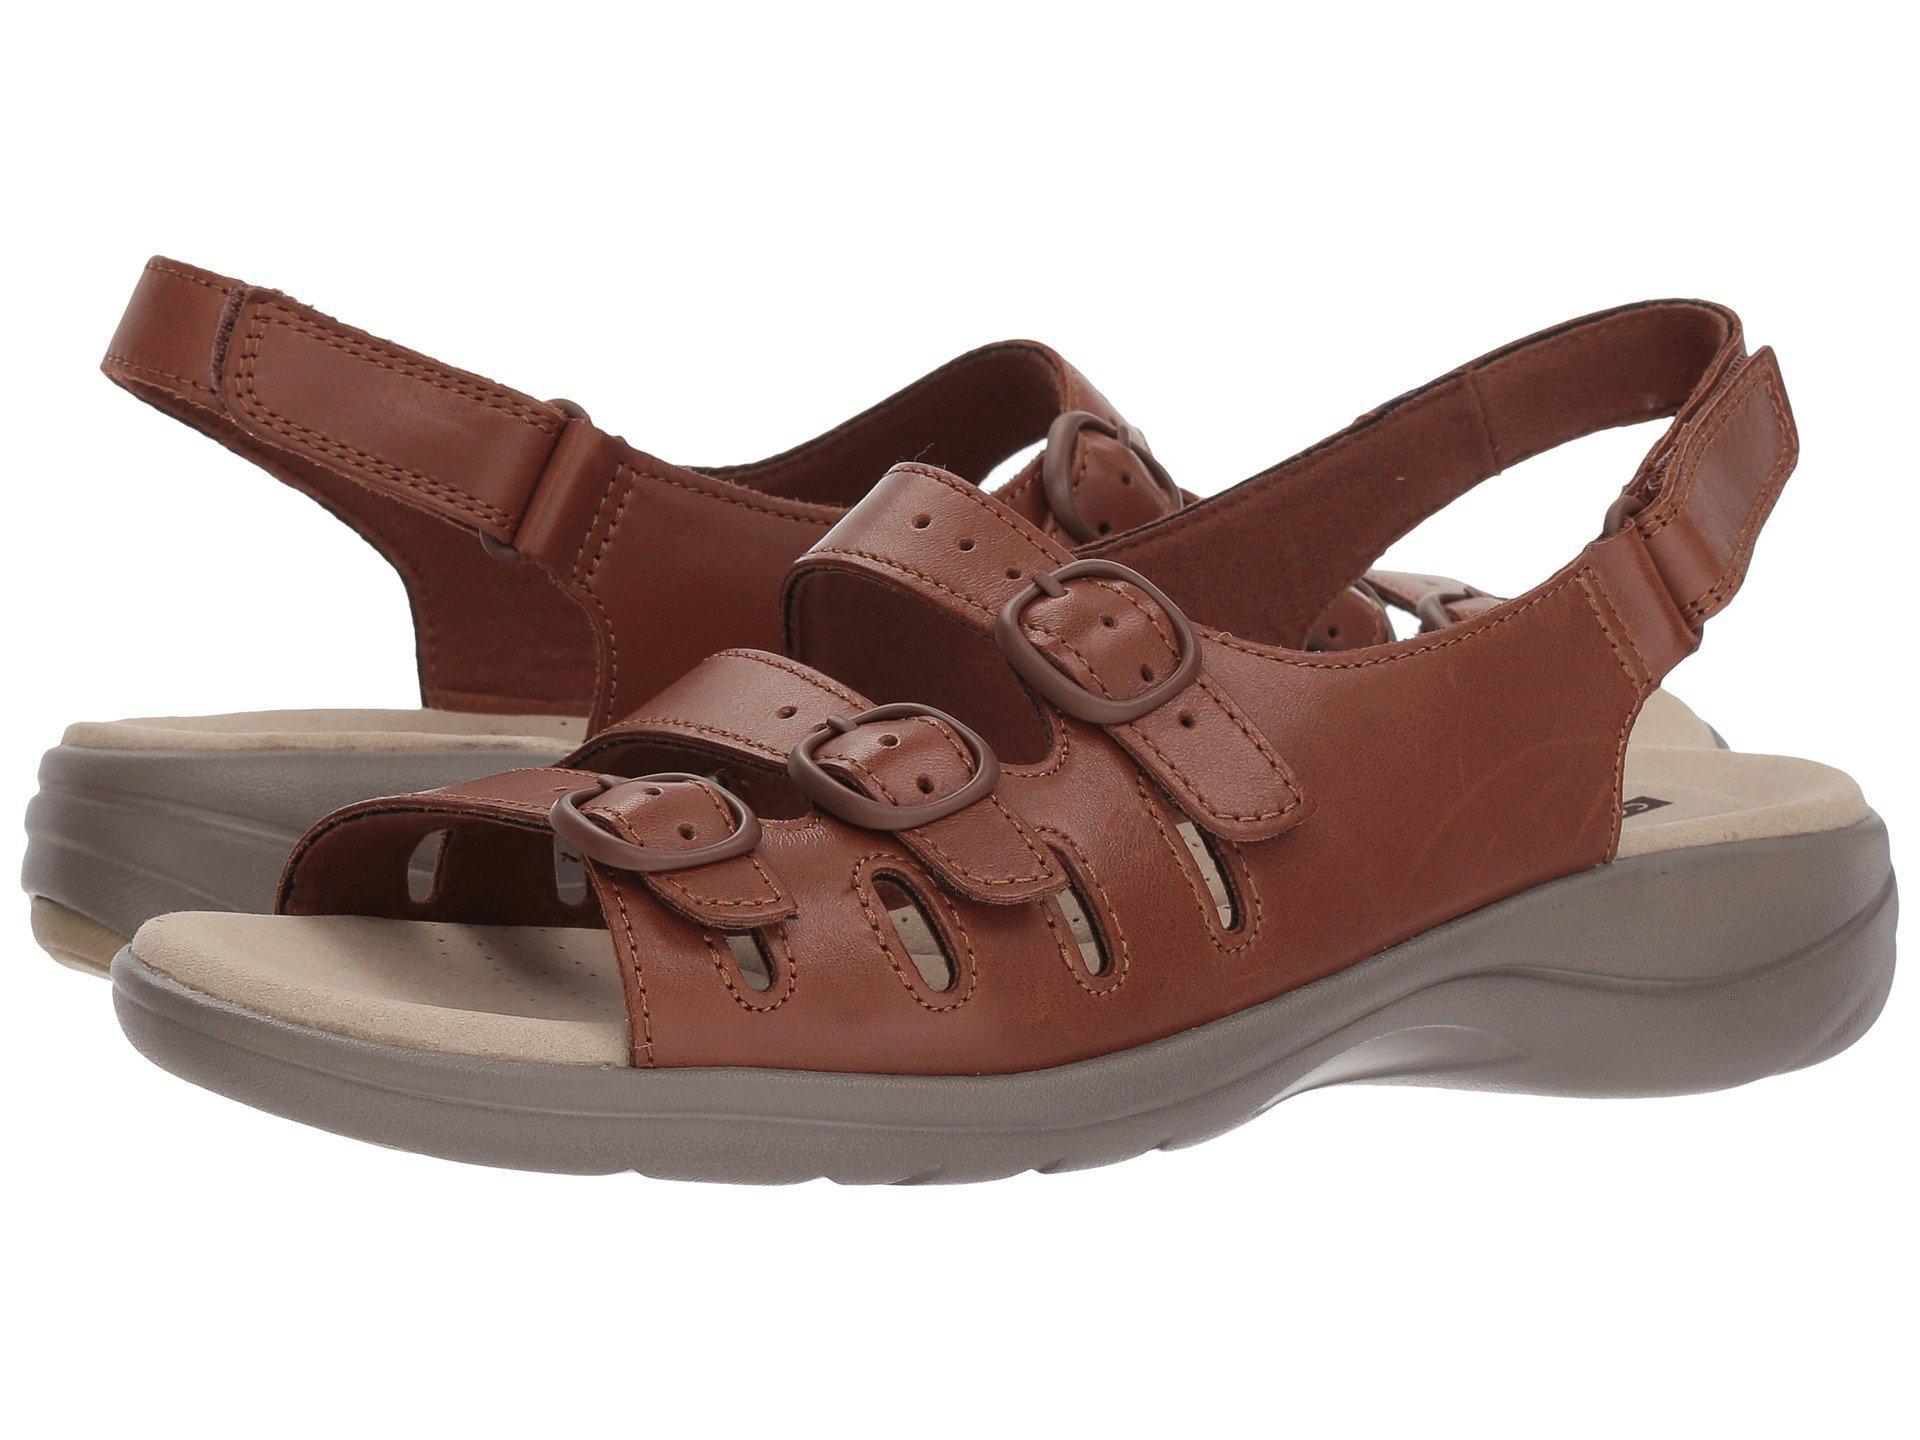 49eeb2b0a3d Lyst - Clarks Saylie Quartz (tan Leather) Women s Sandals in Brown